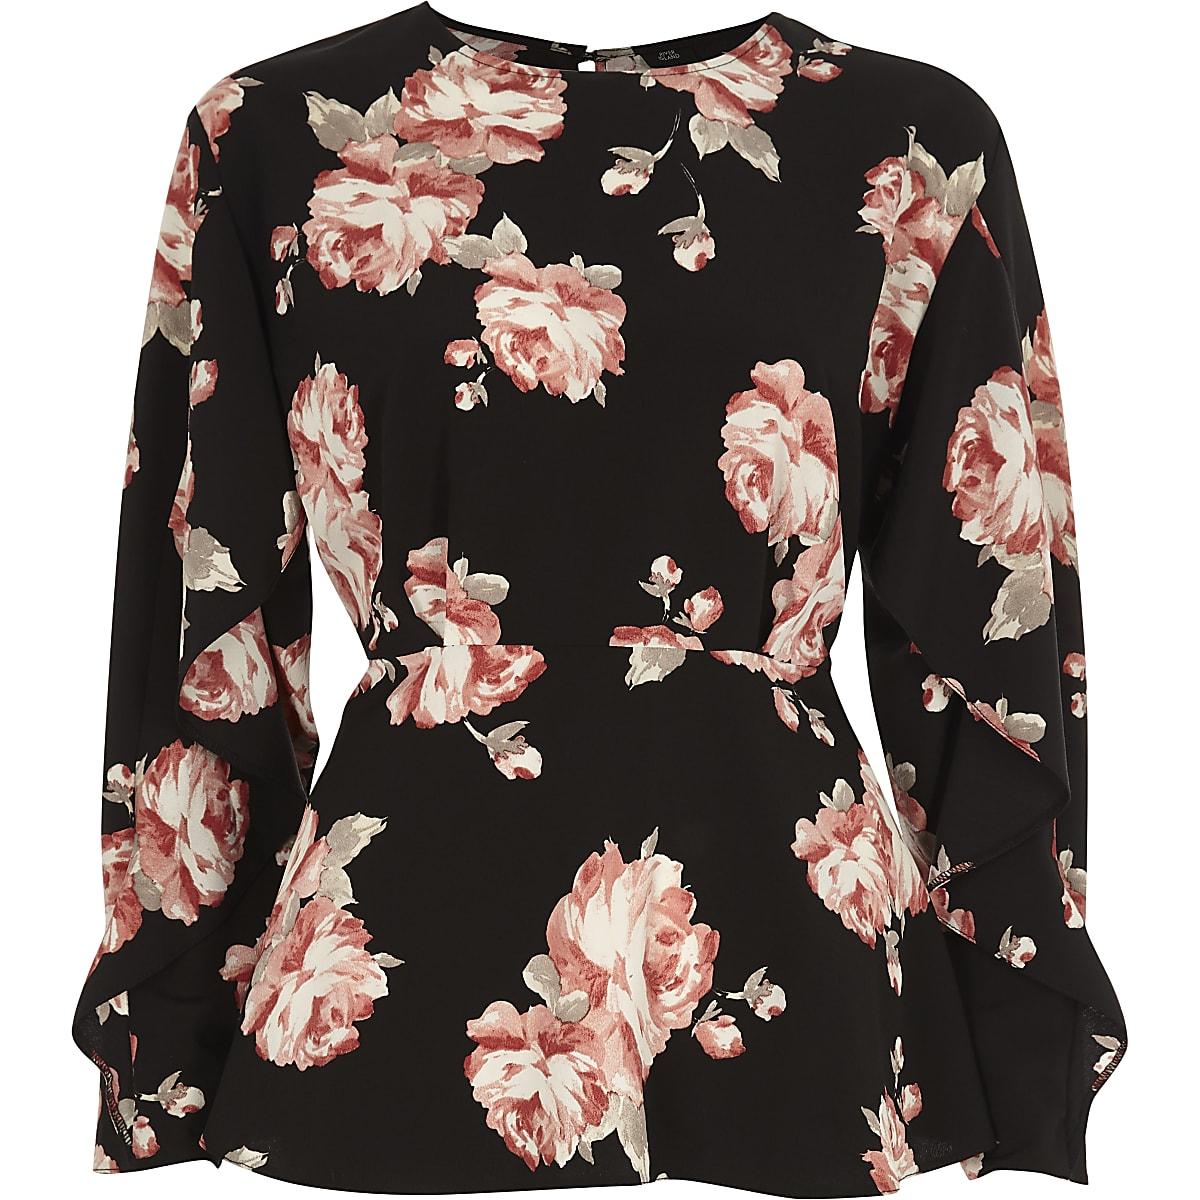 7c1d1b22fcf0bc Black floral frill sleeve blouse - Blouses - Tops - women